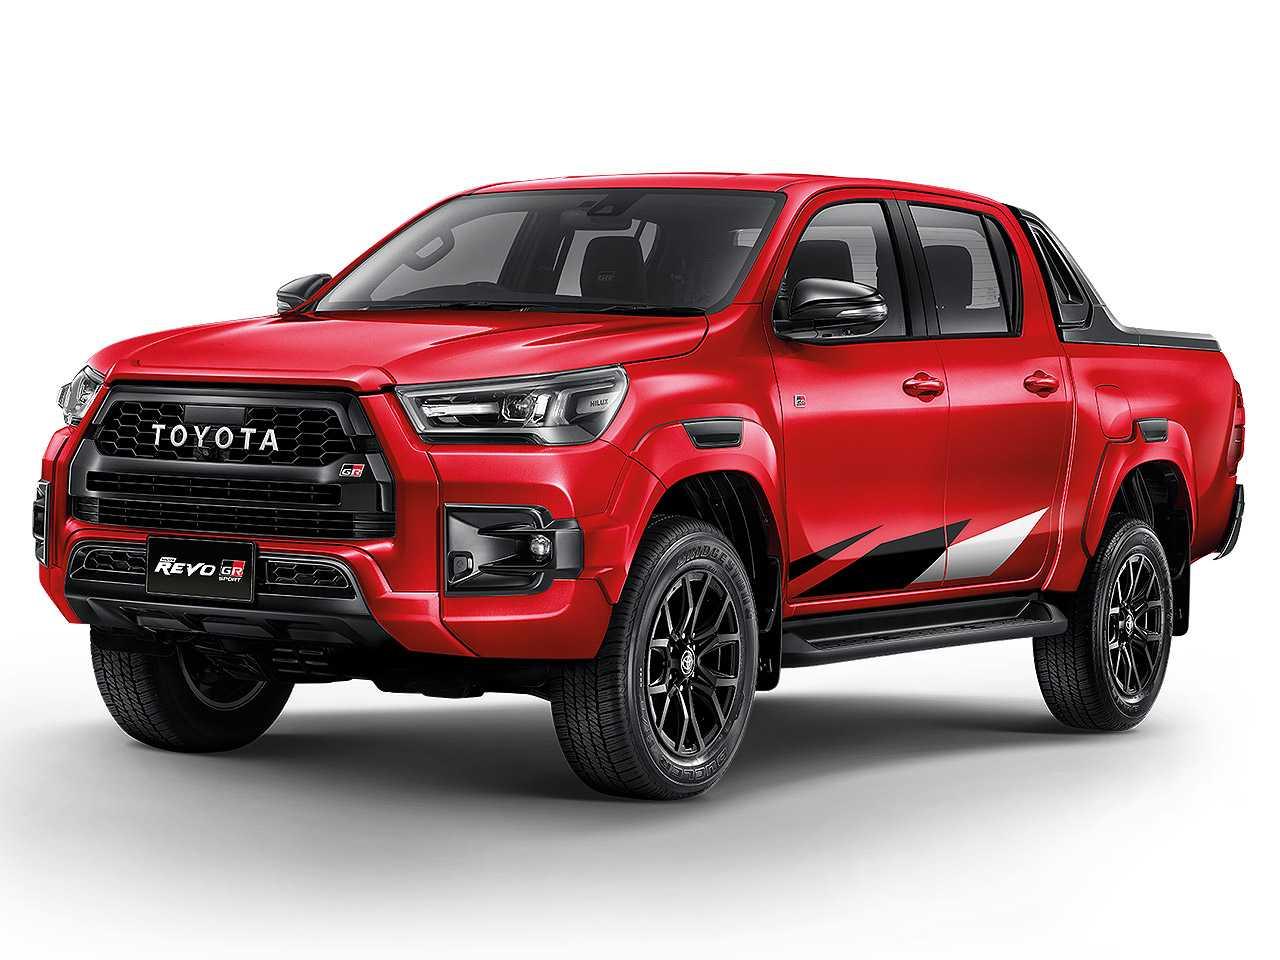 Acima a Toyota Hilux Revo GR Sport revelada na Tailândia